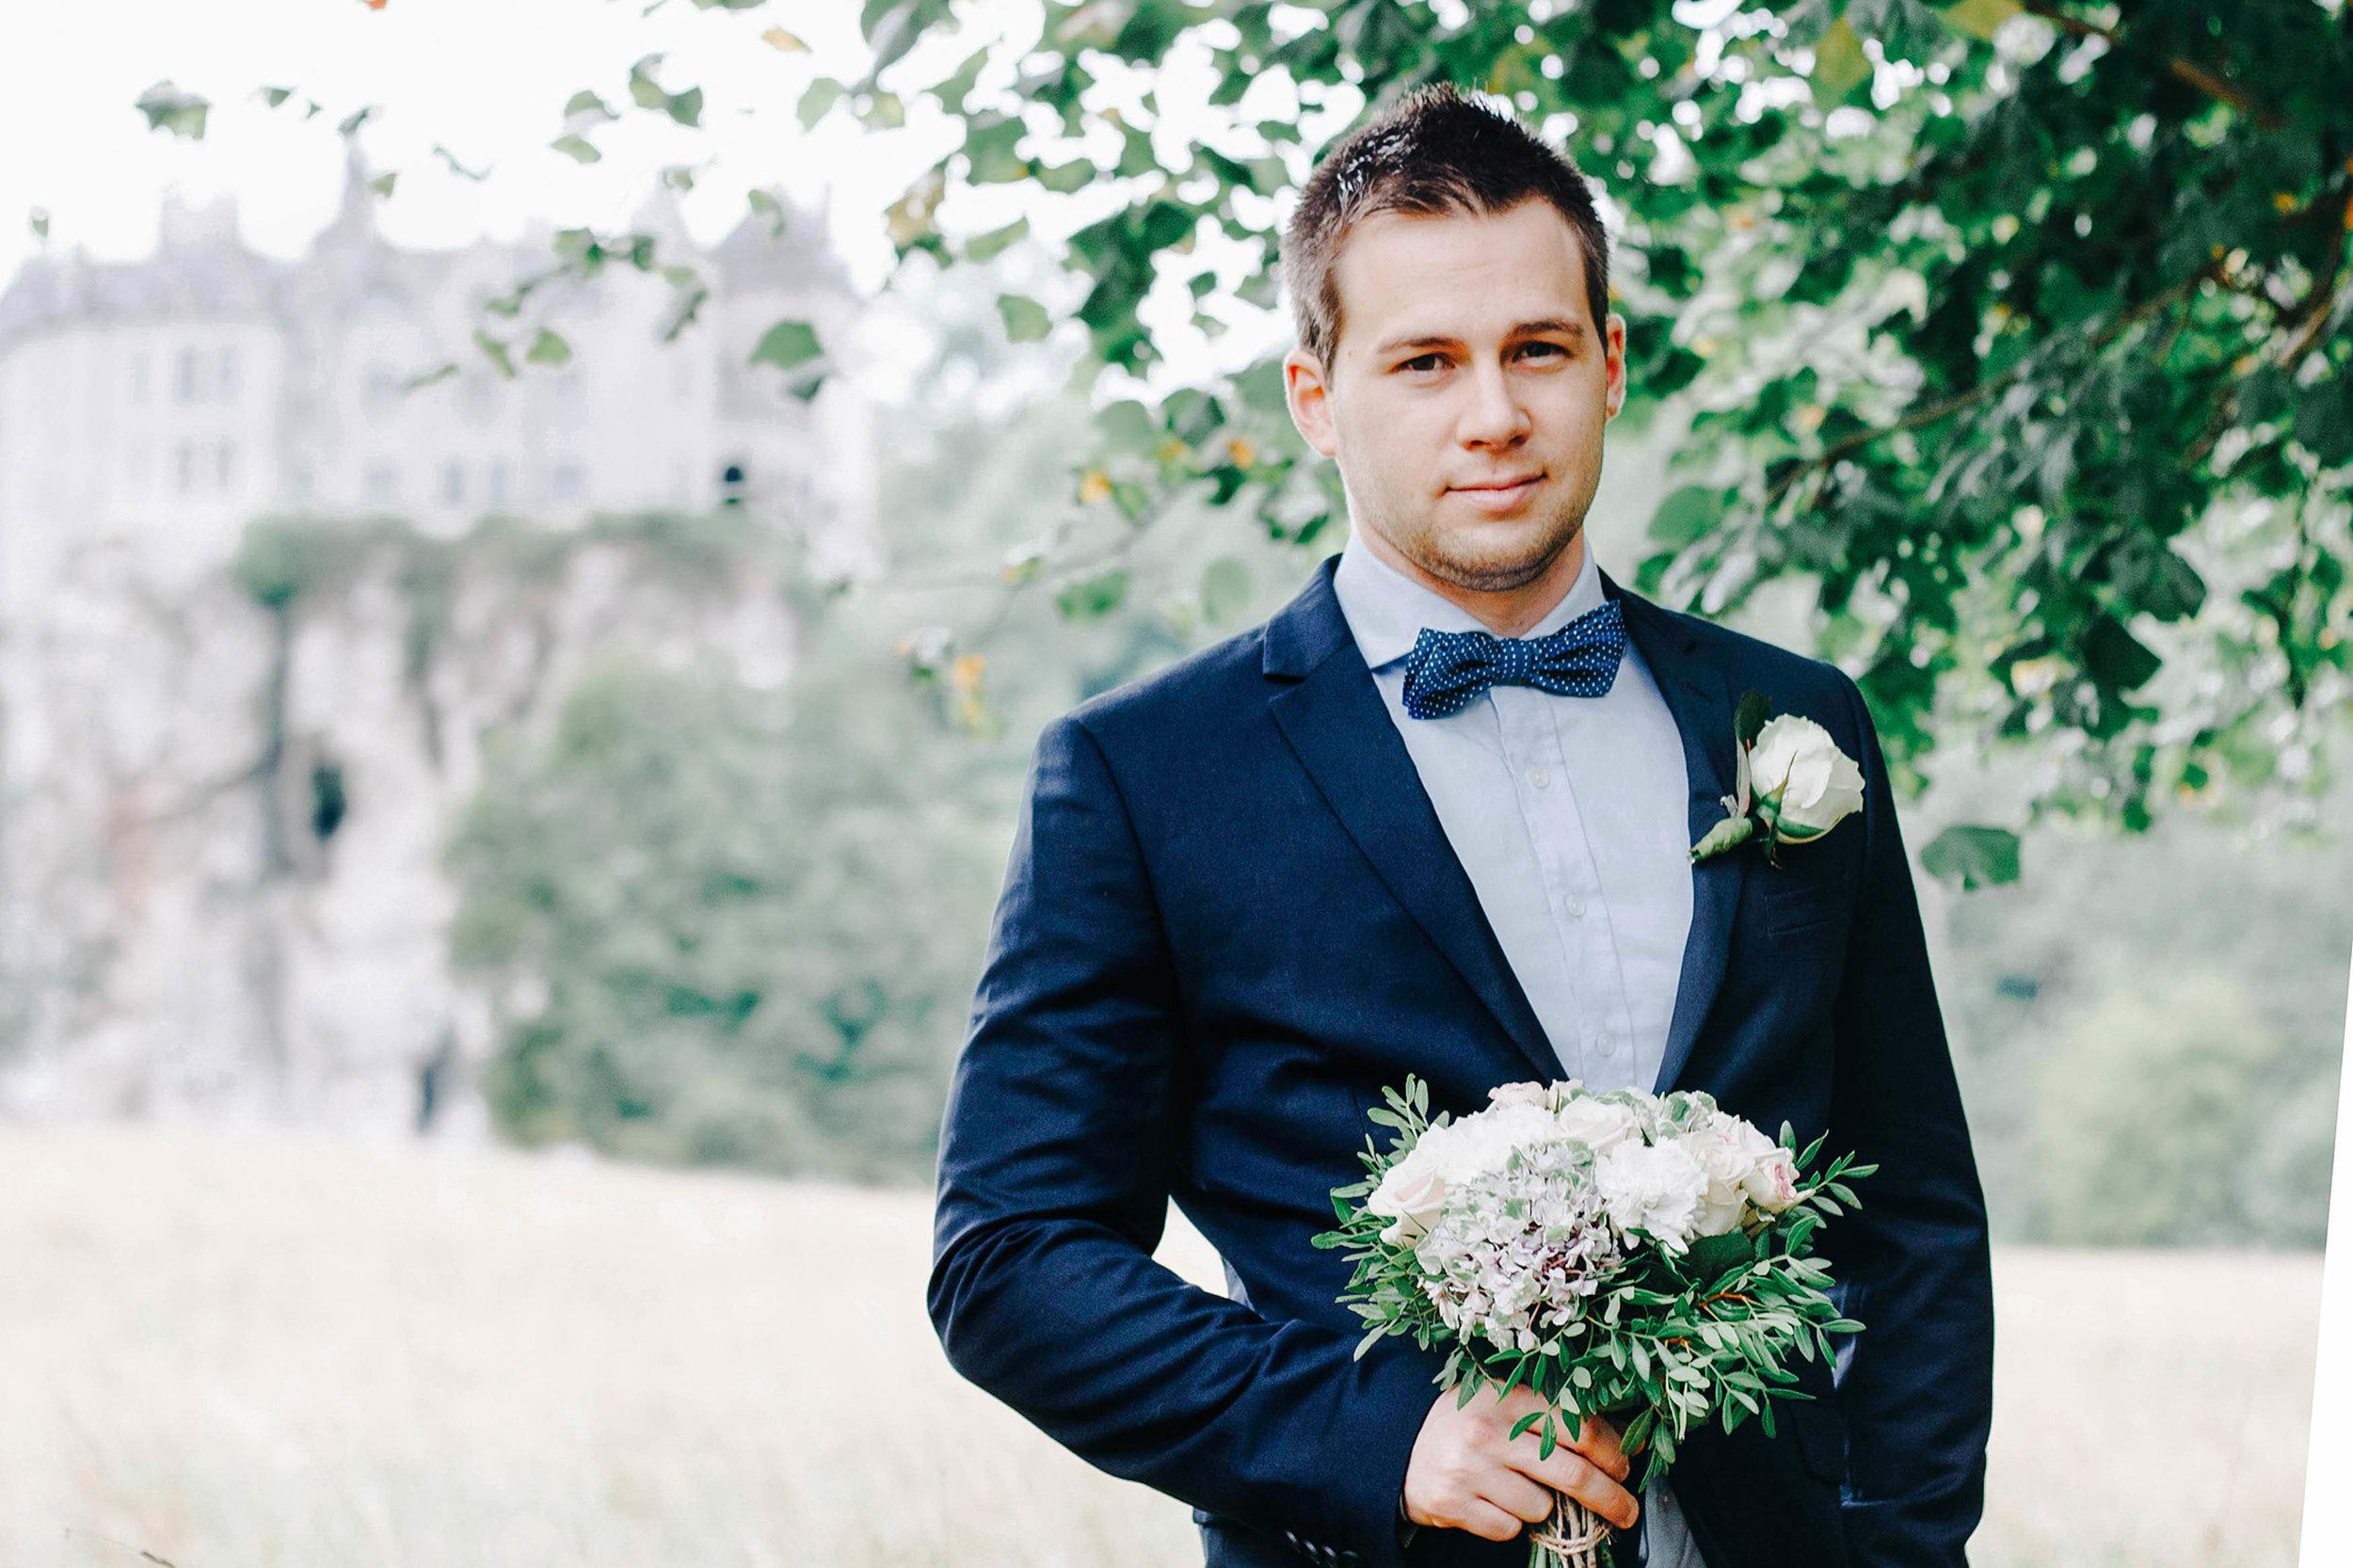 c-photographe-videaste-mariage-bruxelles-leleu-2.jpg